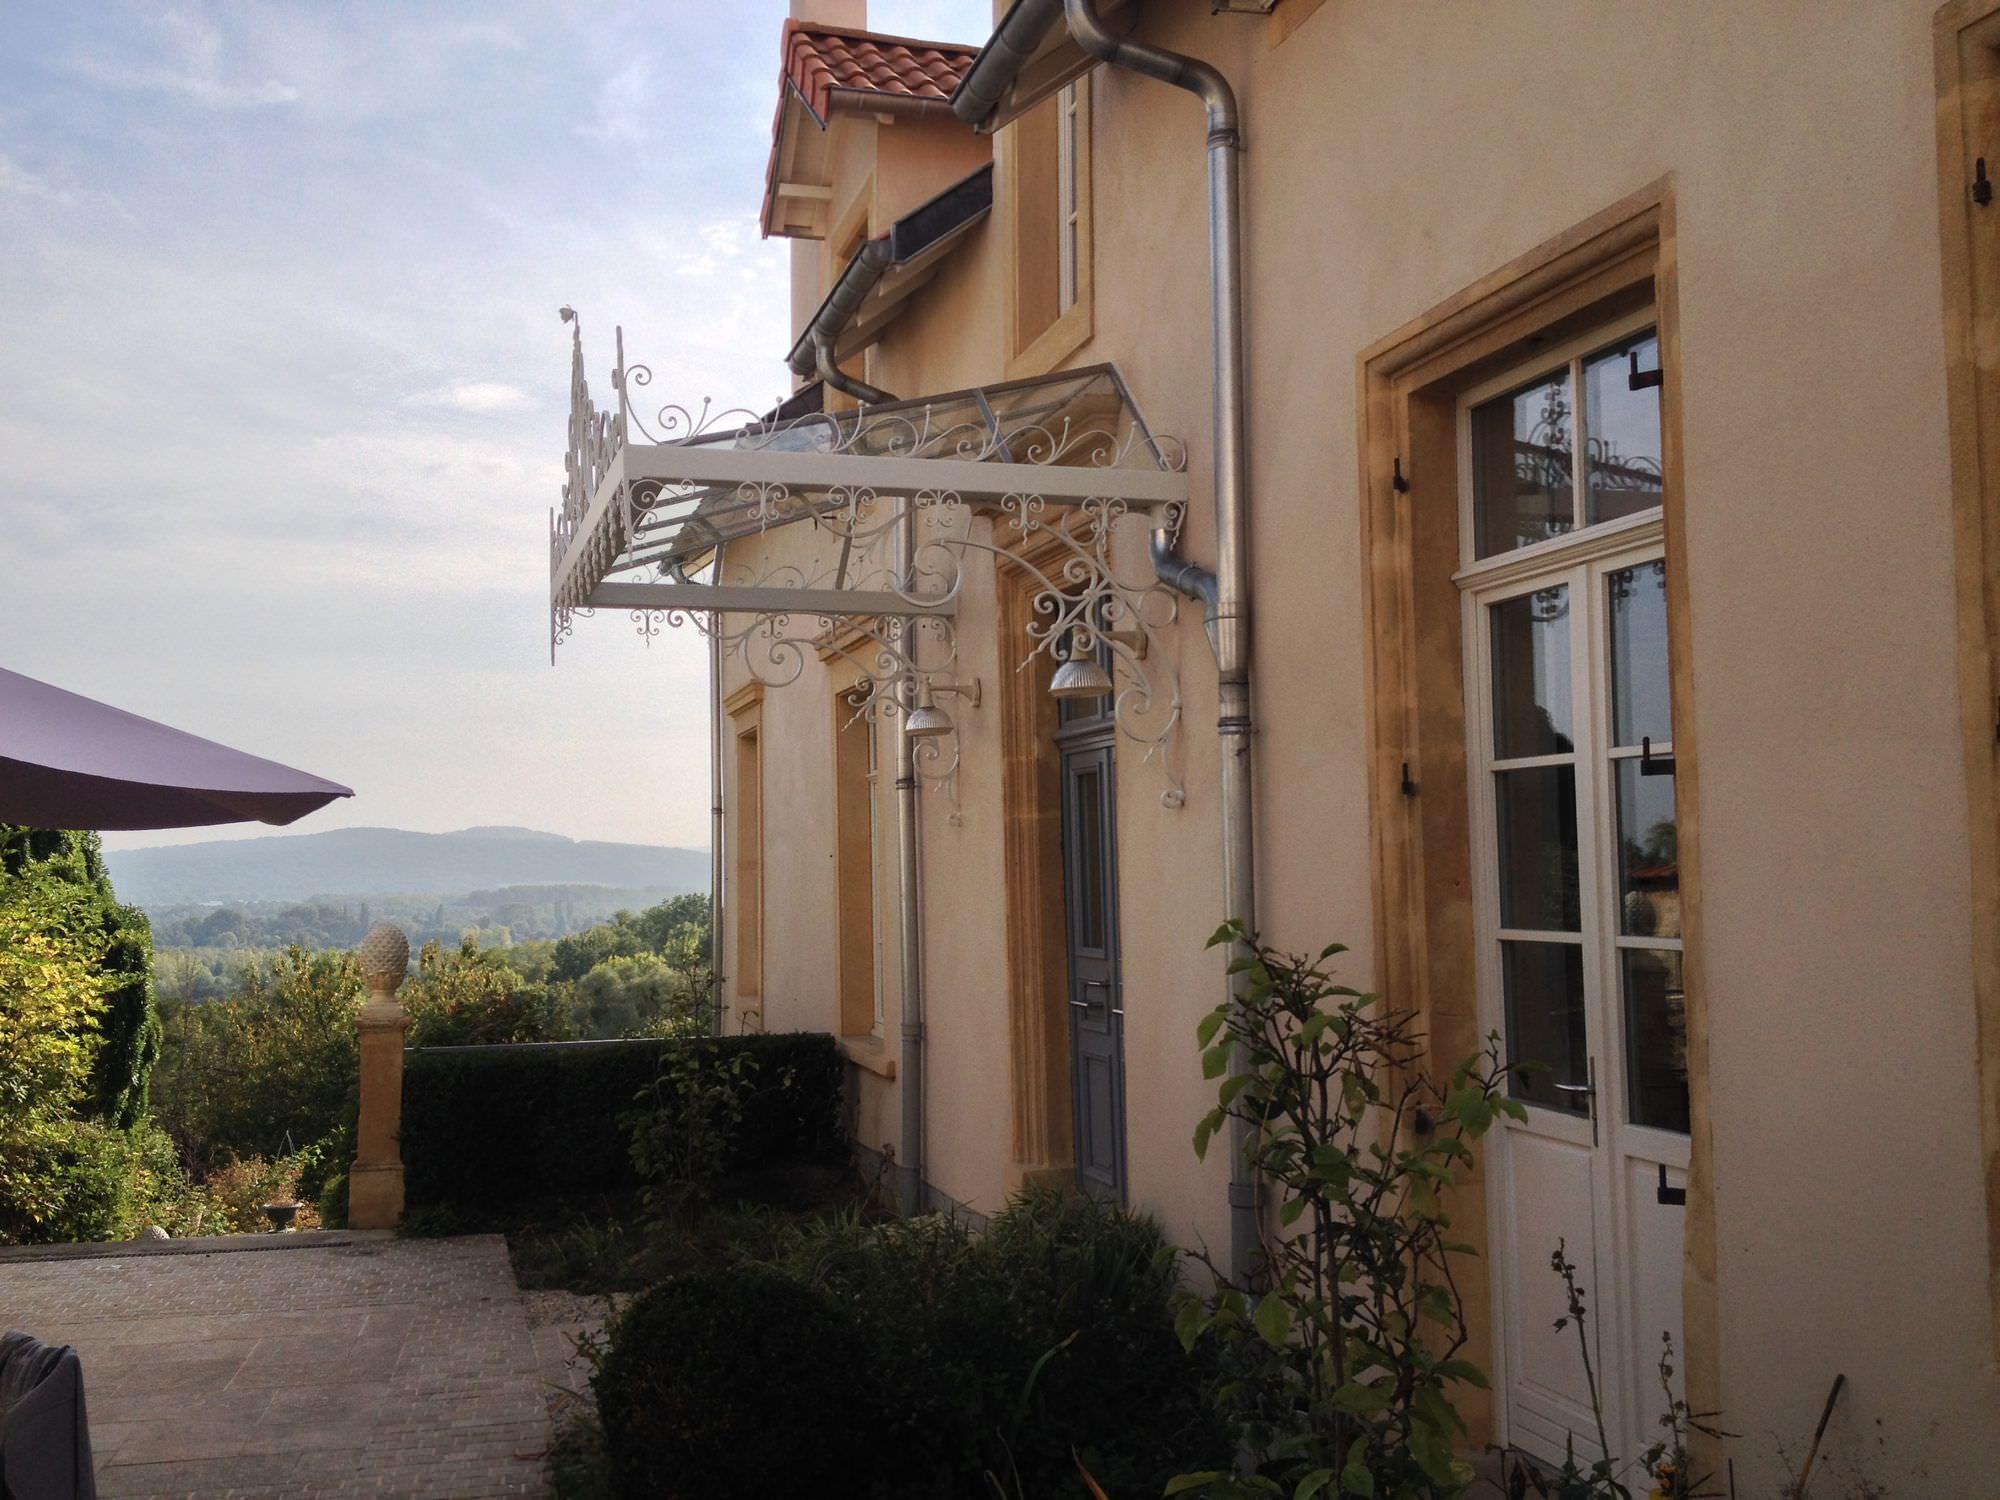 Entrance Canopy Glass Wrought Iron Precast